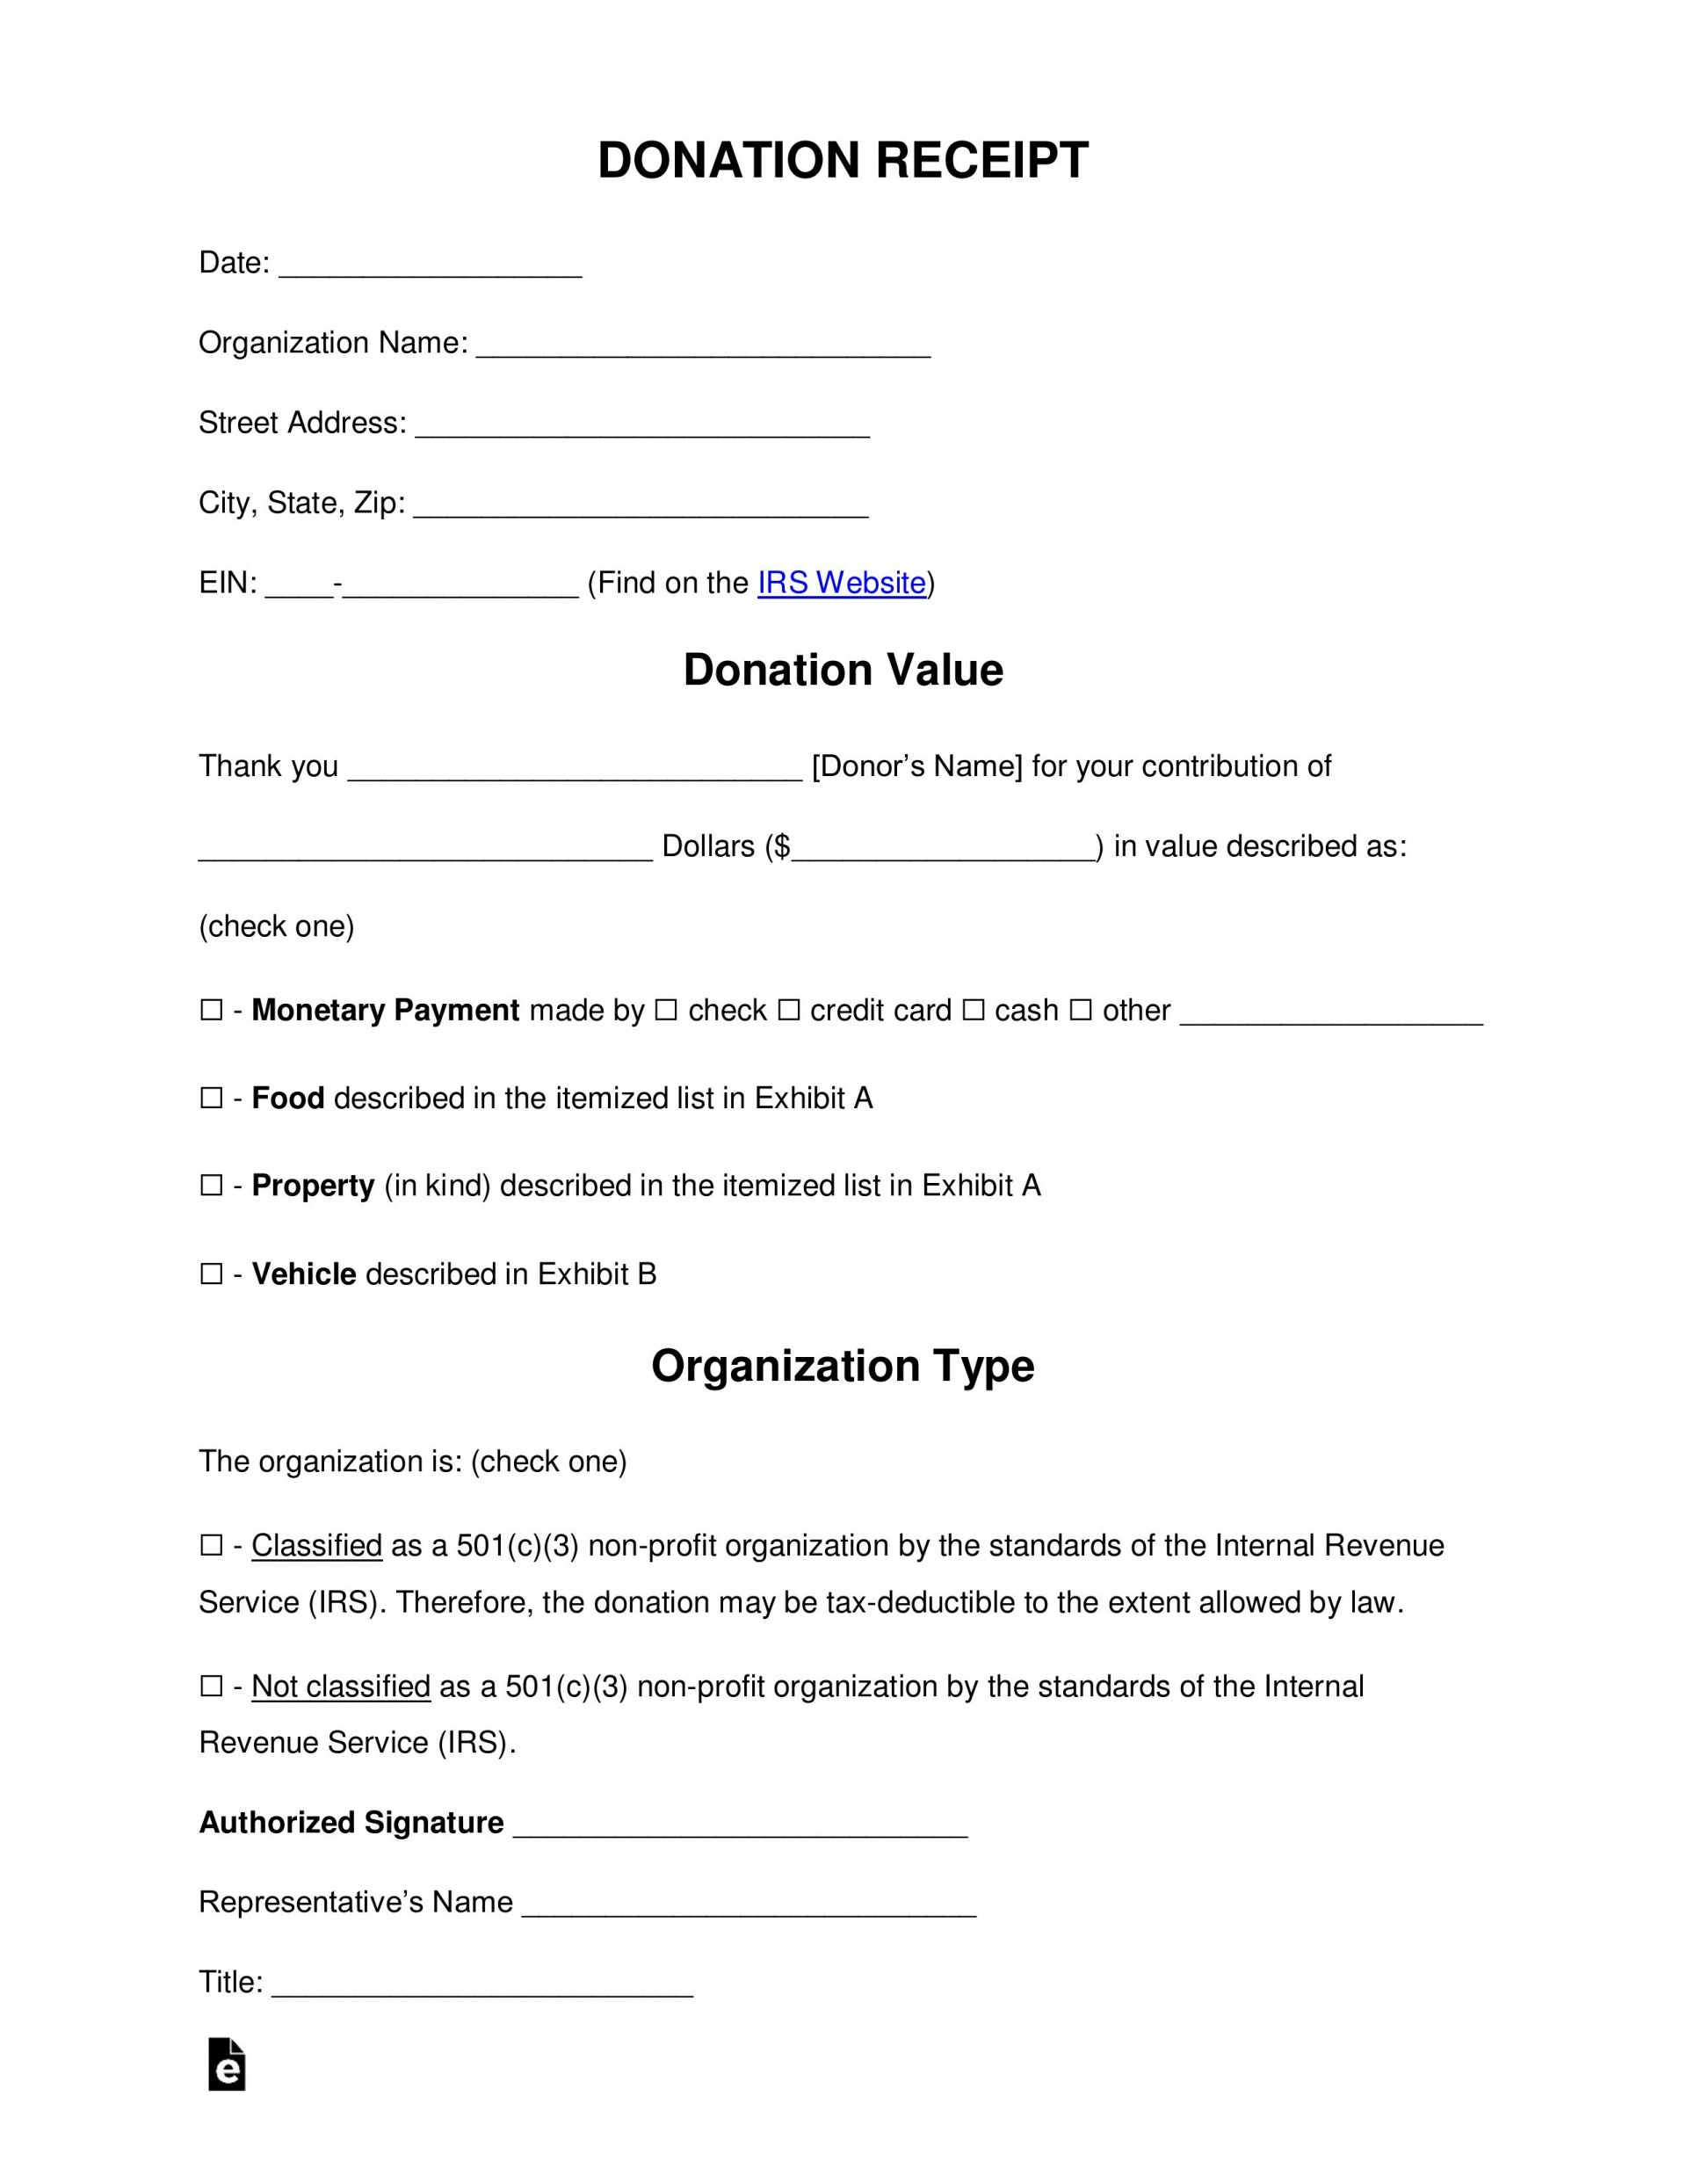 006 Breathtaking Tax Donation Receipt Template High Def  Canadian Charitable Letter Church Deduction1920